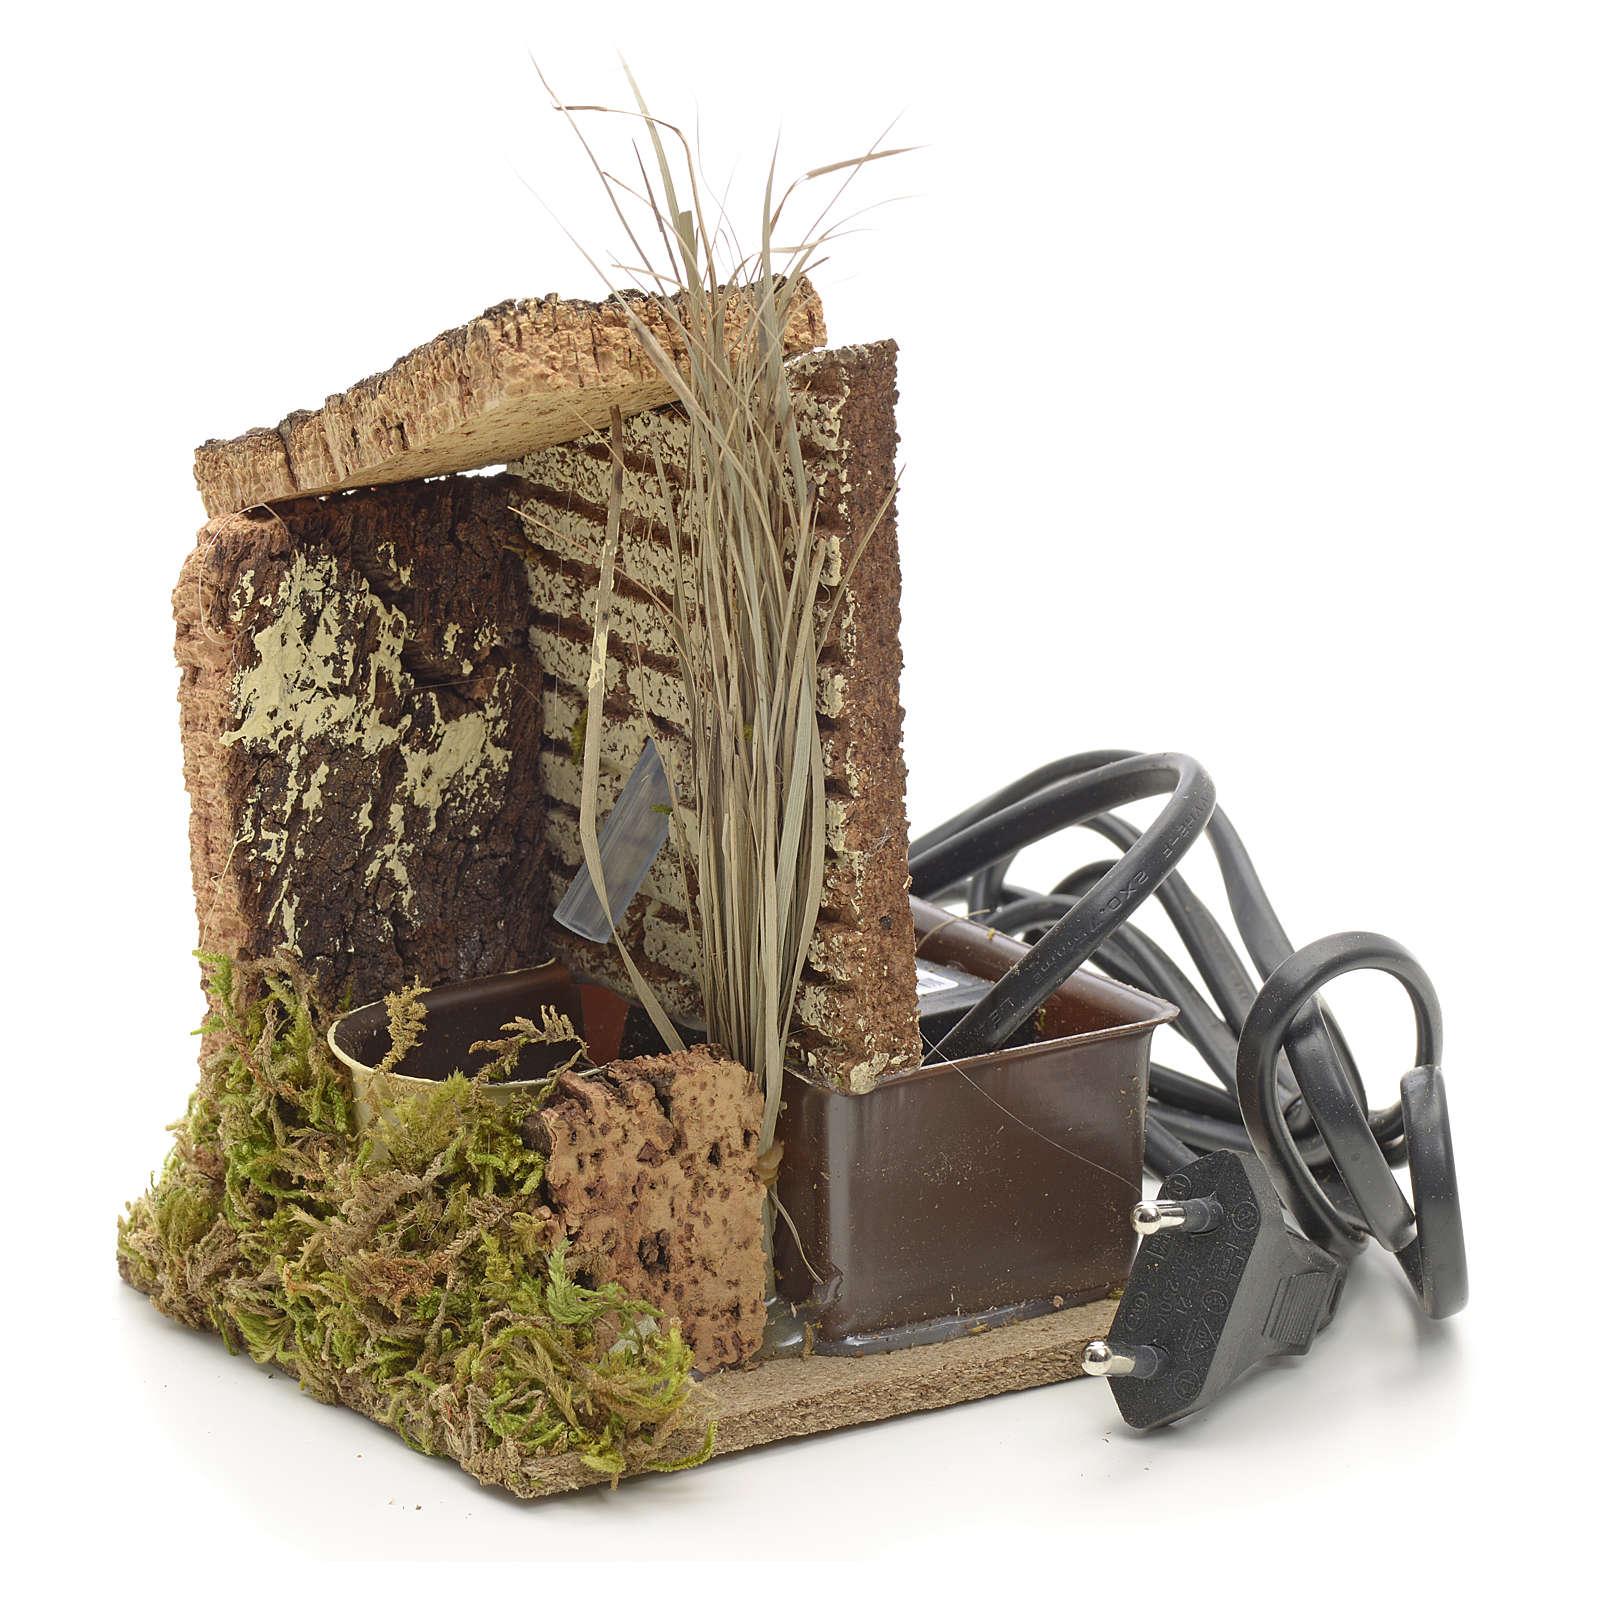 Pila pesebre madera corcho musgo 13x10x9 4